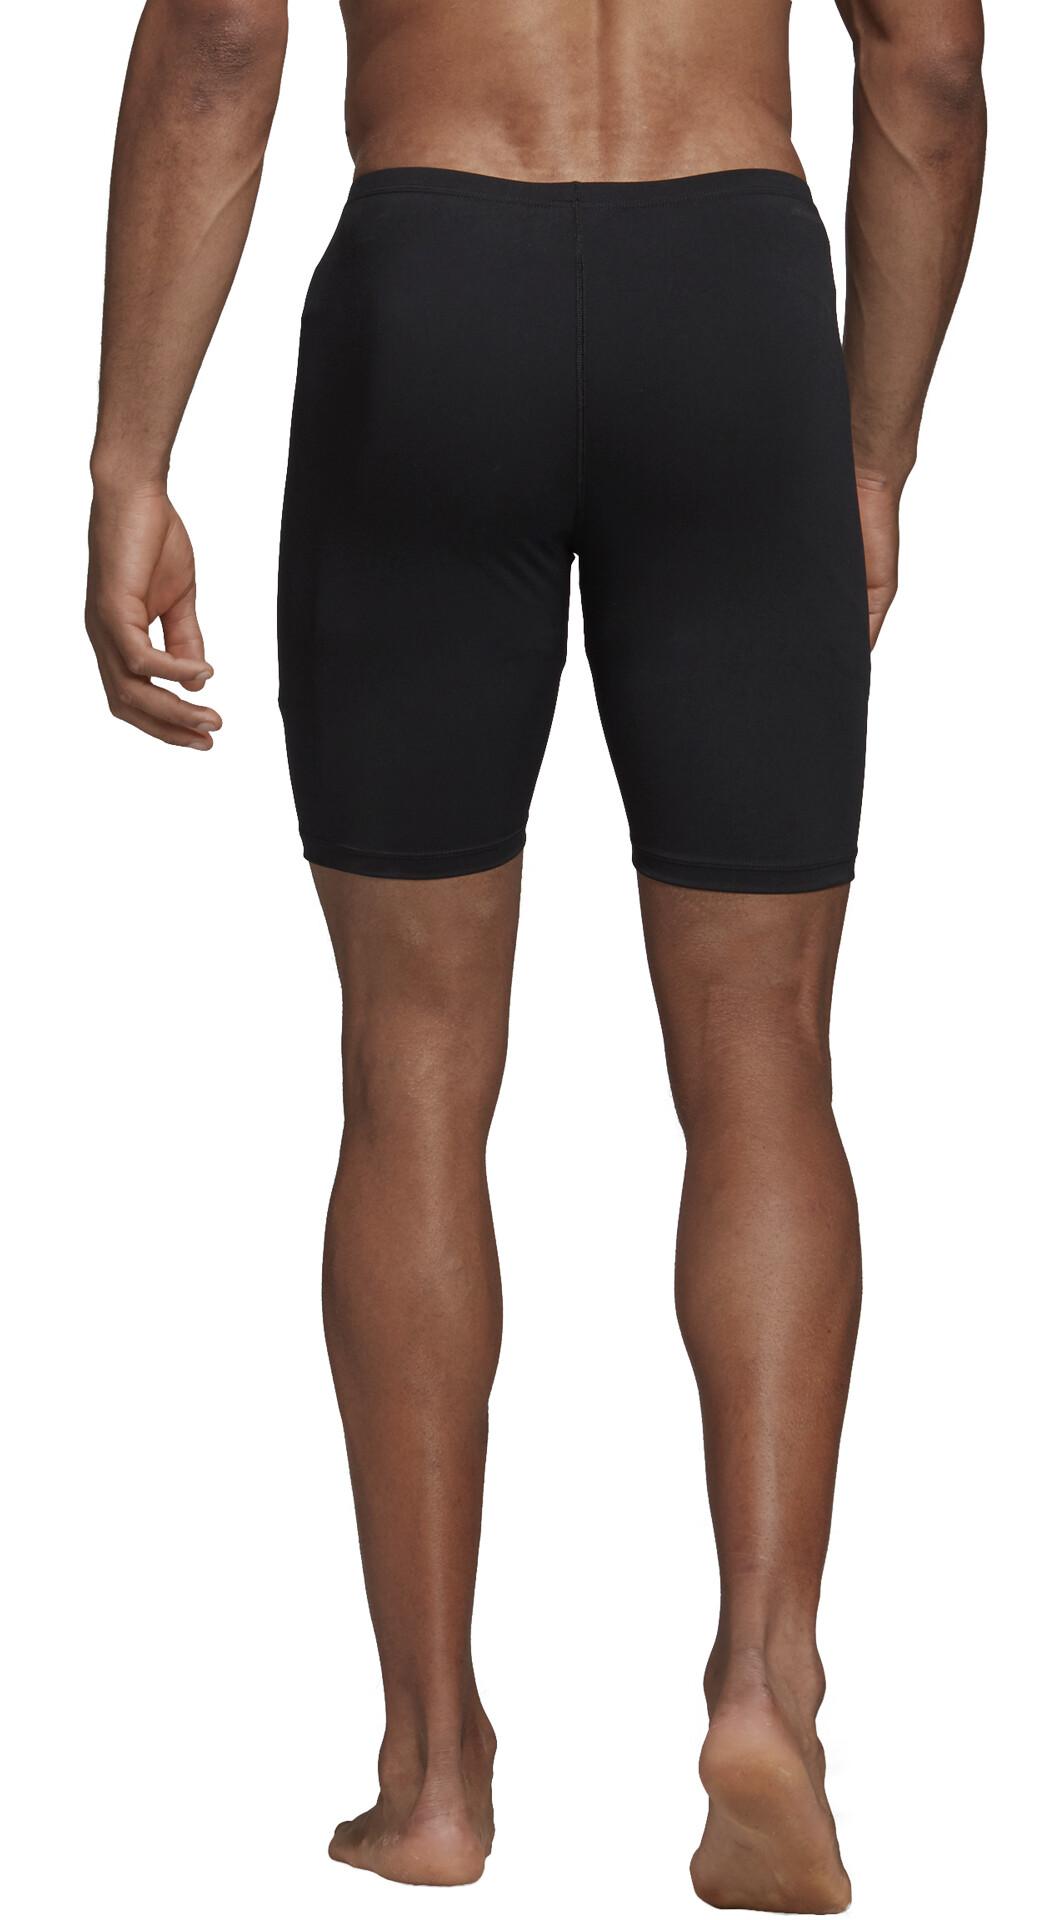 386f6051 adidas Pro Solid Swimming Jammers Men black/white | Gode tilbud hos ...